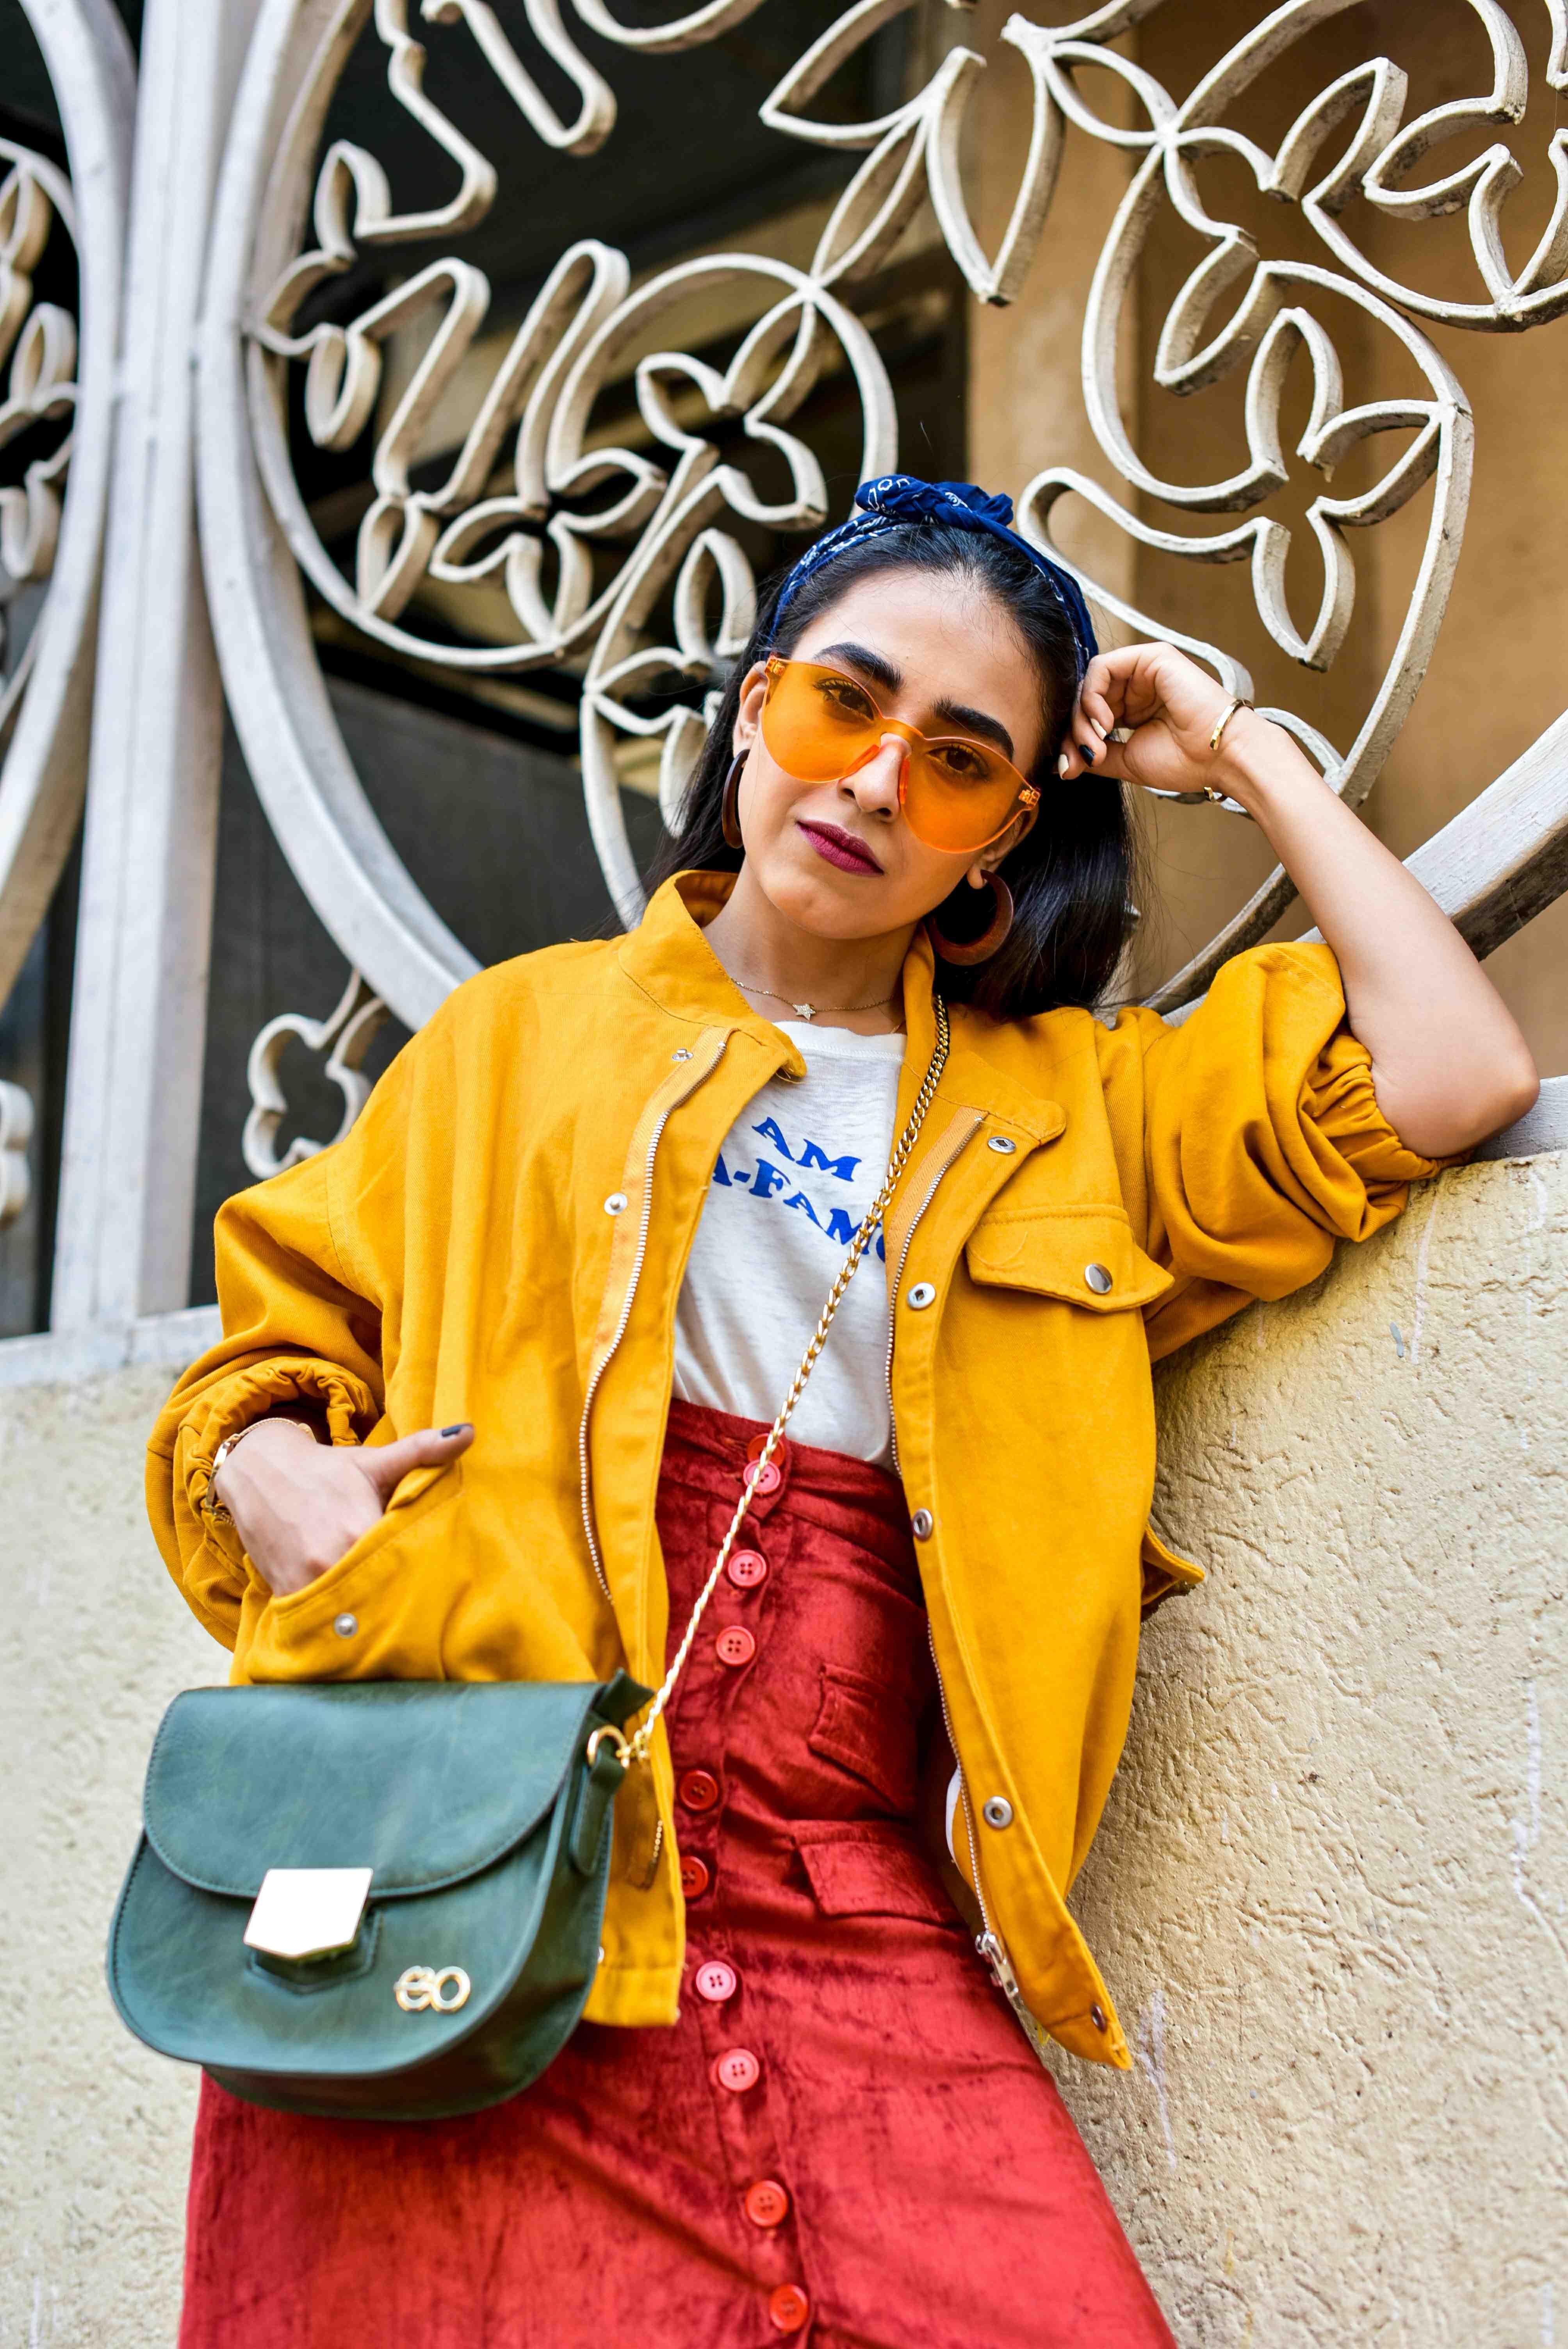 yellow, pantone color, mustard street style, streetstyle, indian street style, blogger fashion, blogger outfit, outfits, ootd, yellow outfit, yellow jacket, mustard jacket, mustard street style, 2018 color forecast,